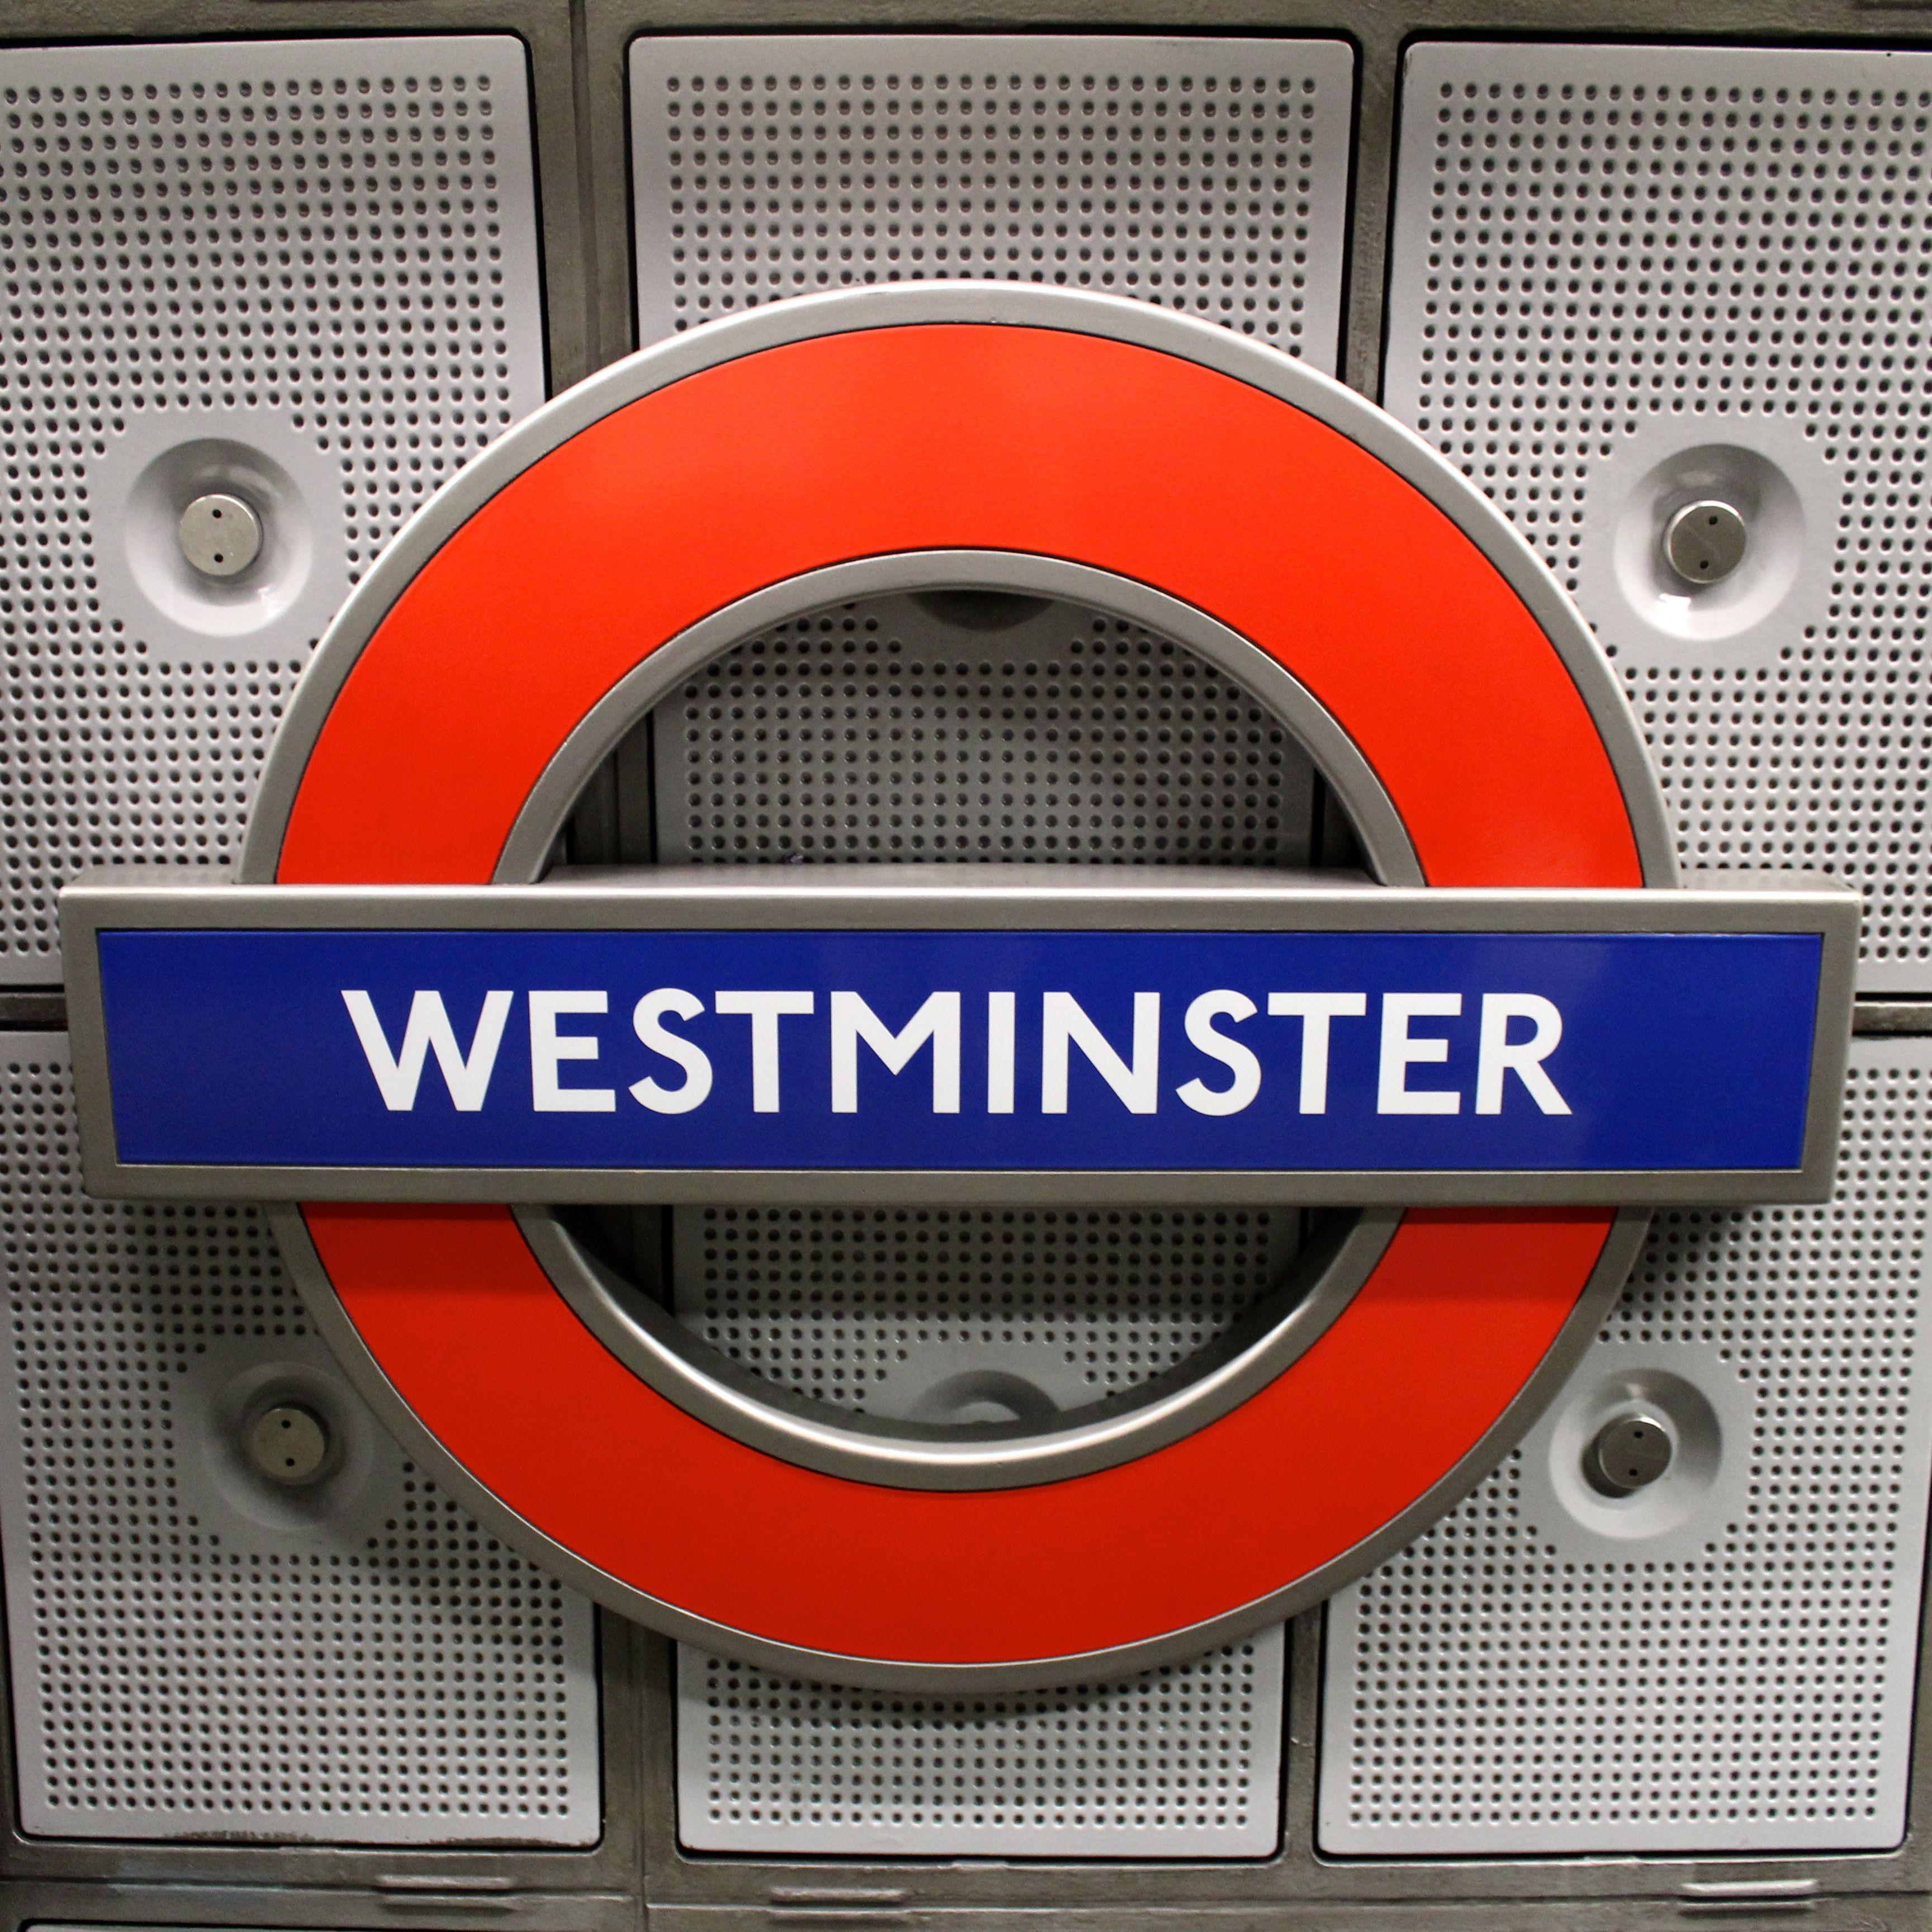 Westminster Tube Station London, England